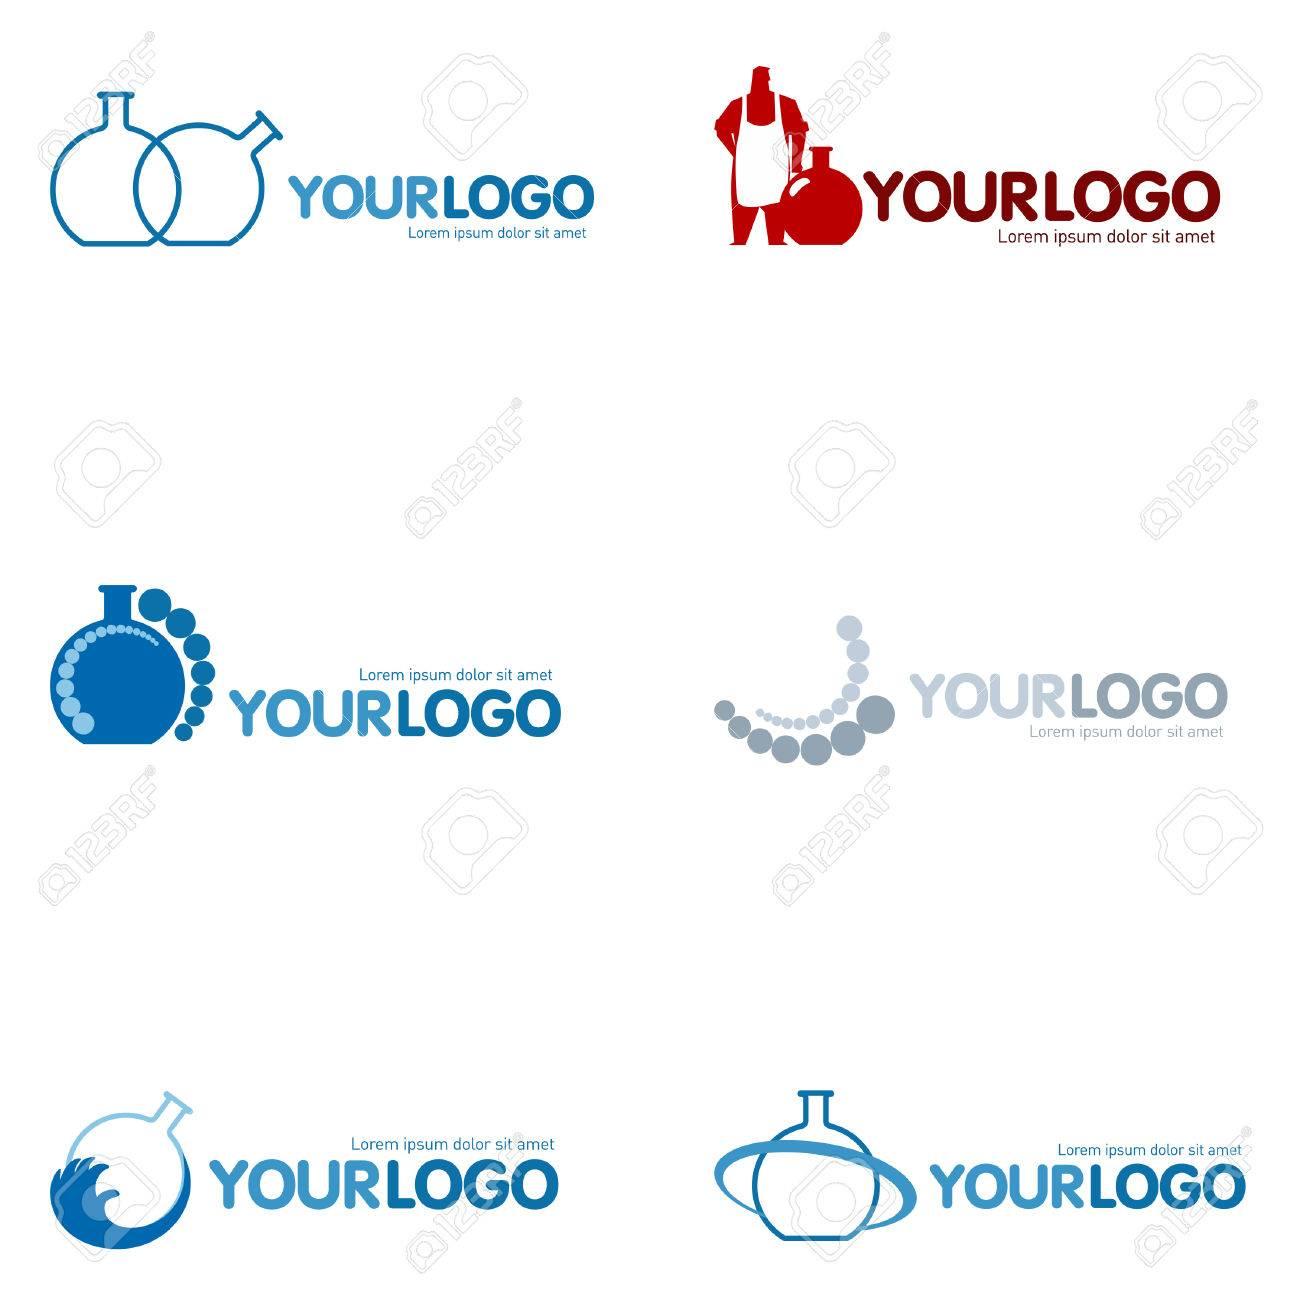 sports logo design ideas sports logo design software photo albums catchy homes interior - Modern Logos Design Ideas